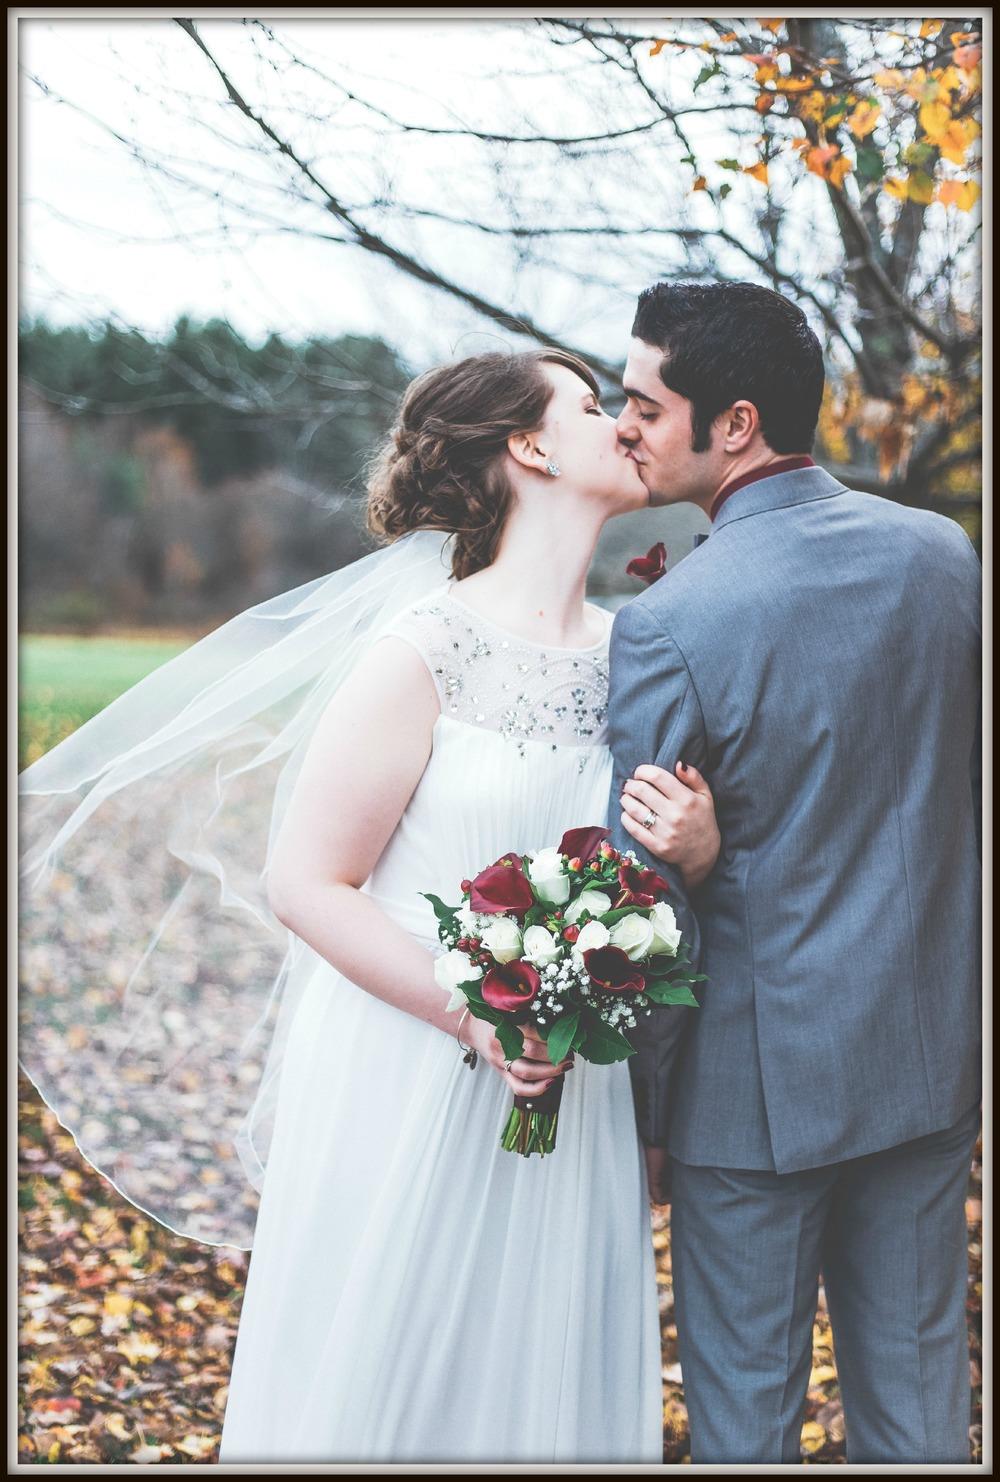 Newlywed Kiss during Autumn Wedding